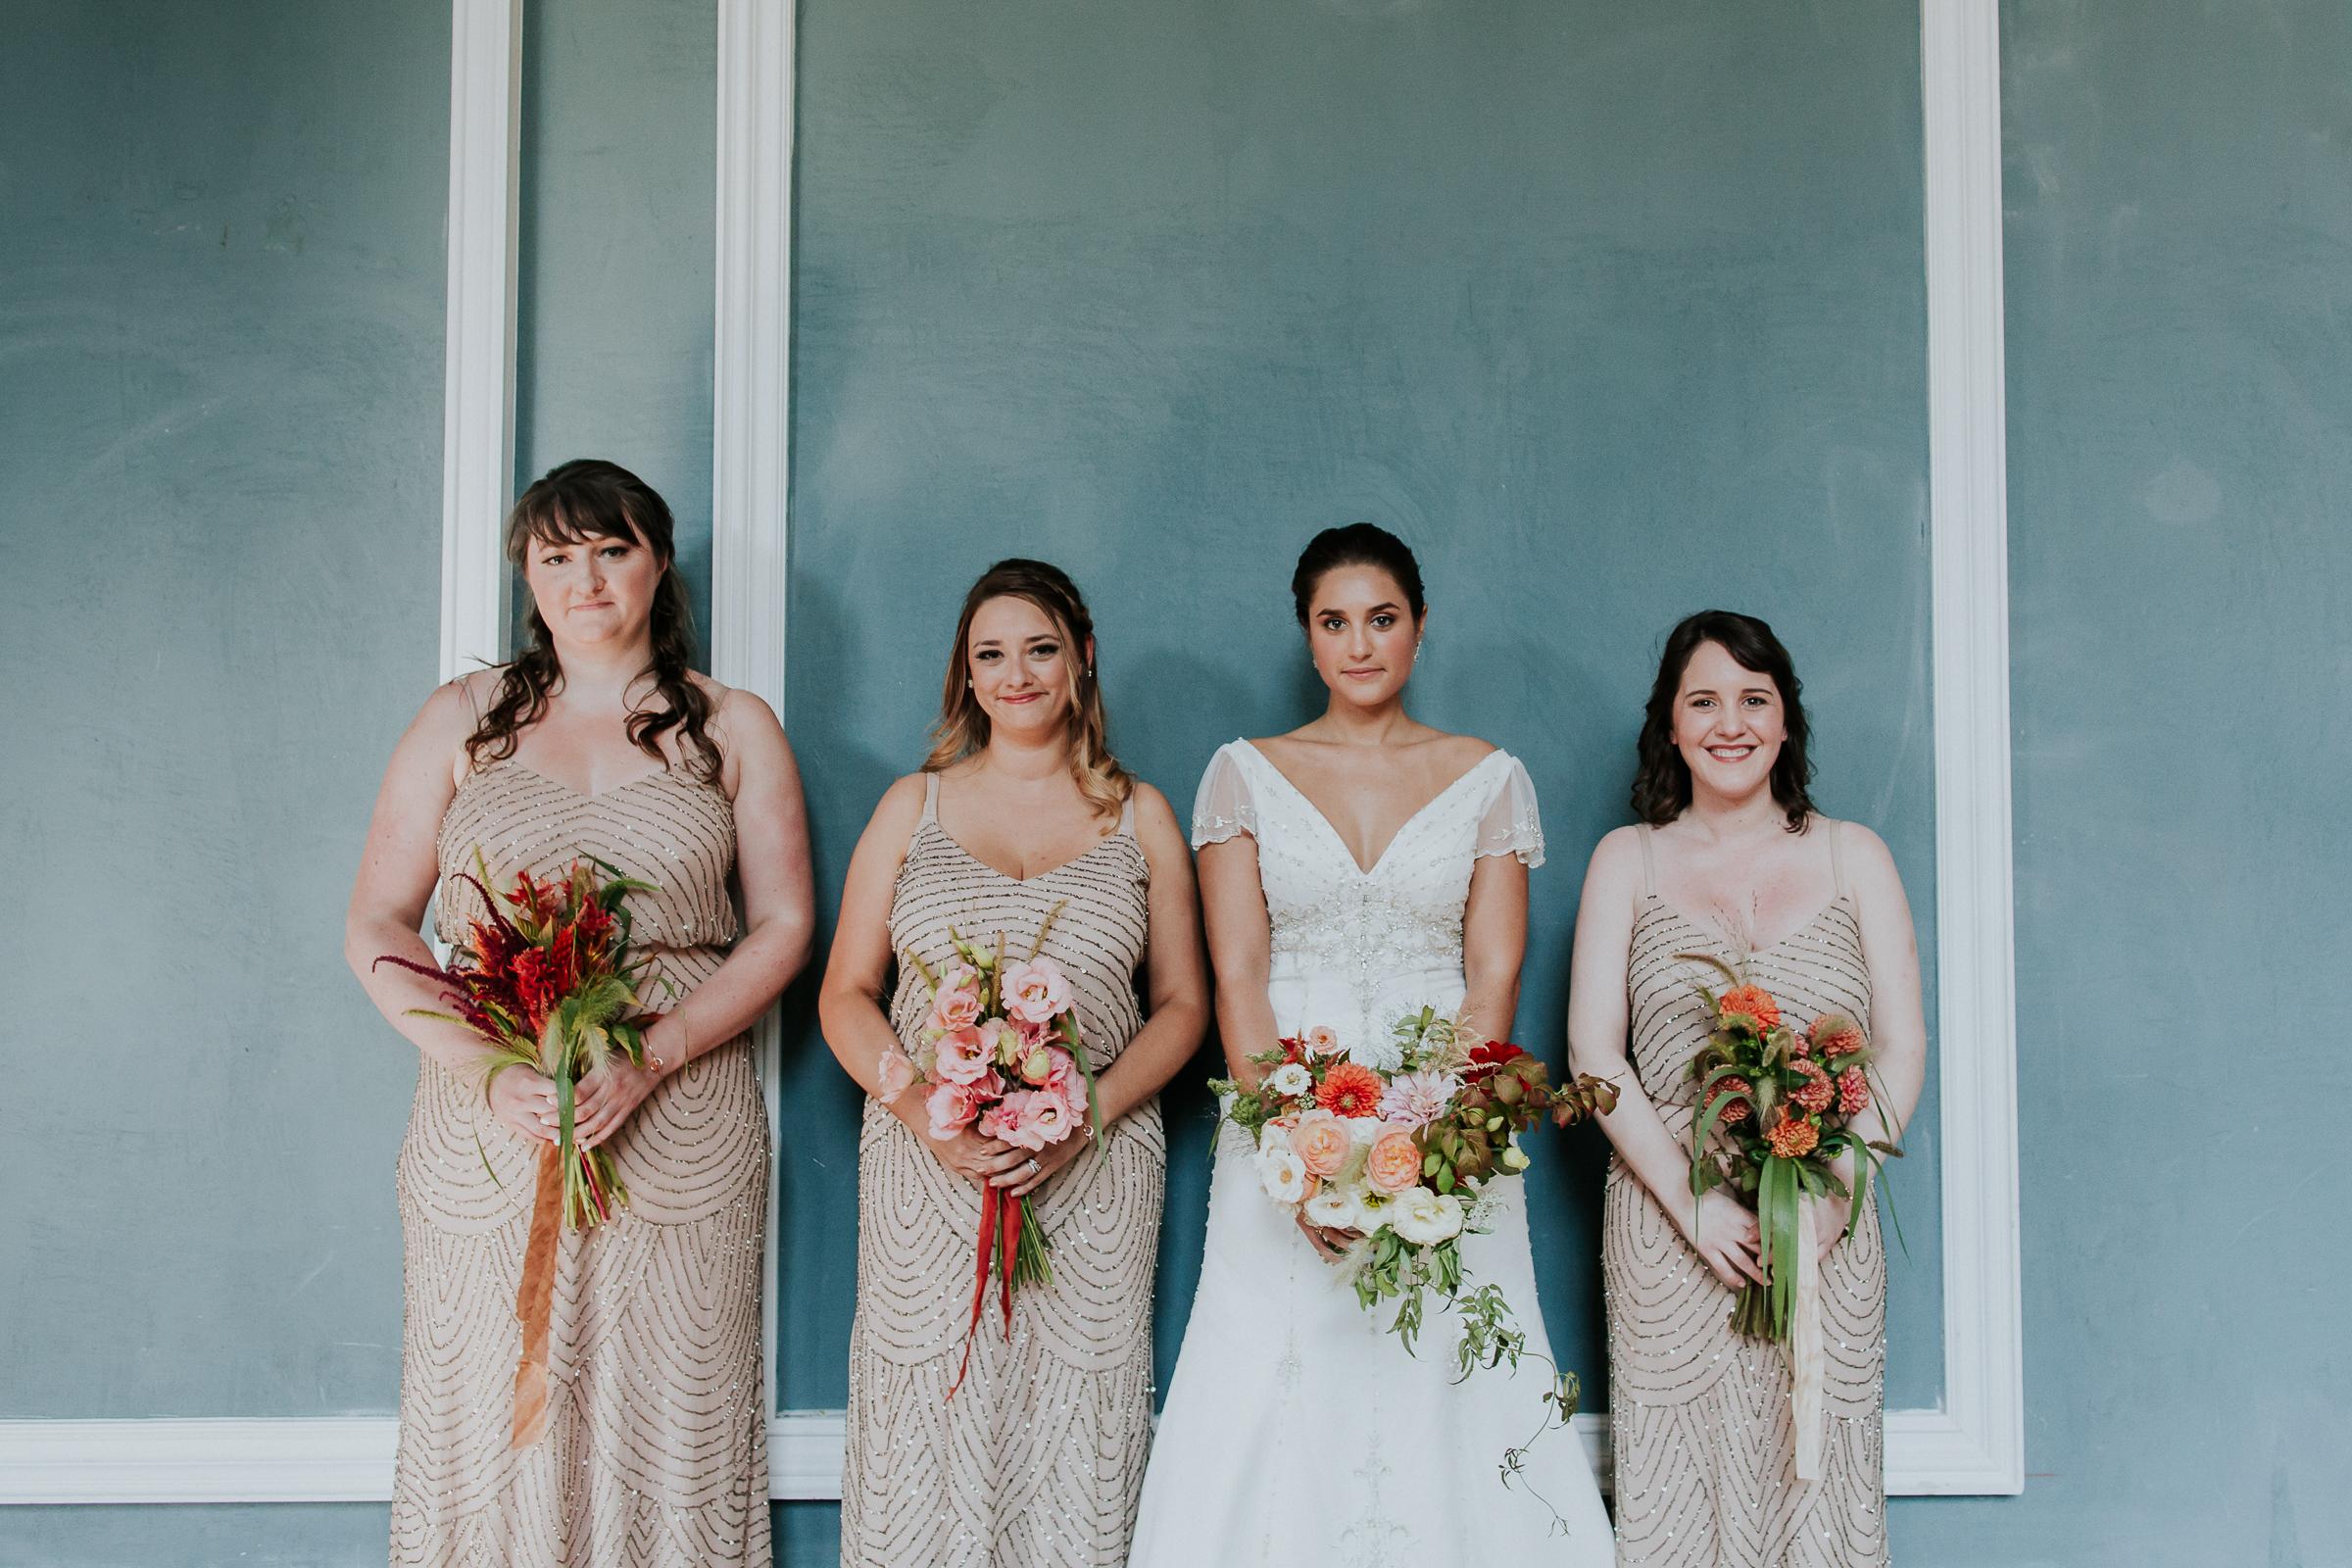 Brooklyn-Winery-NYC-Editorial-Documentary-Wedding-Photographer-Gina-Oli-35.jpg